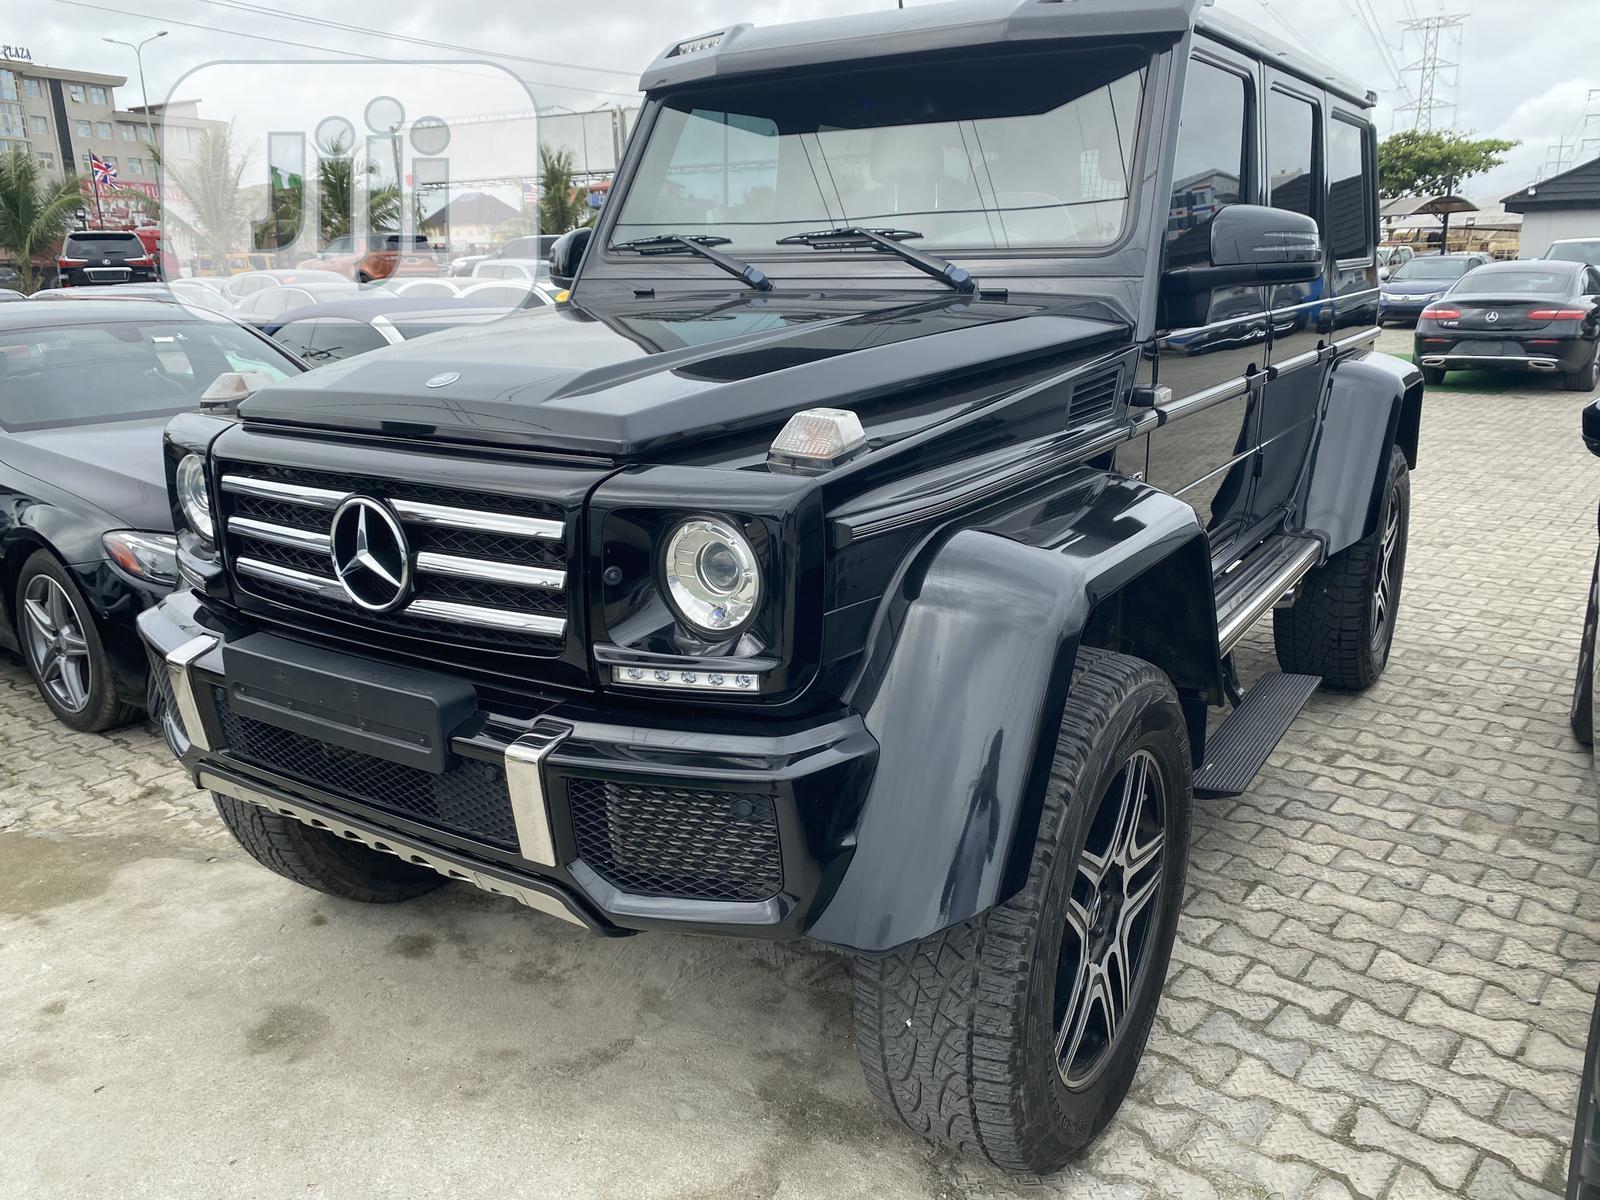 Archive New Mercedes Benz G Class 2016 Black In Lekki Cars Wechue Autos Jiji Ng